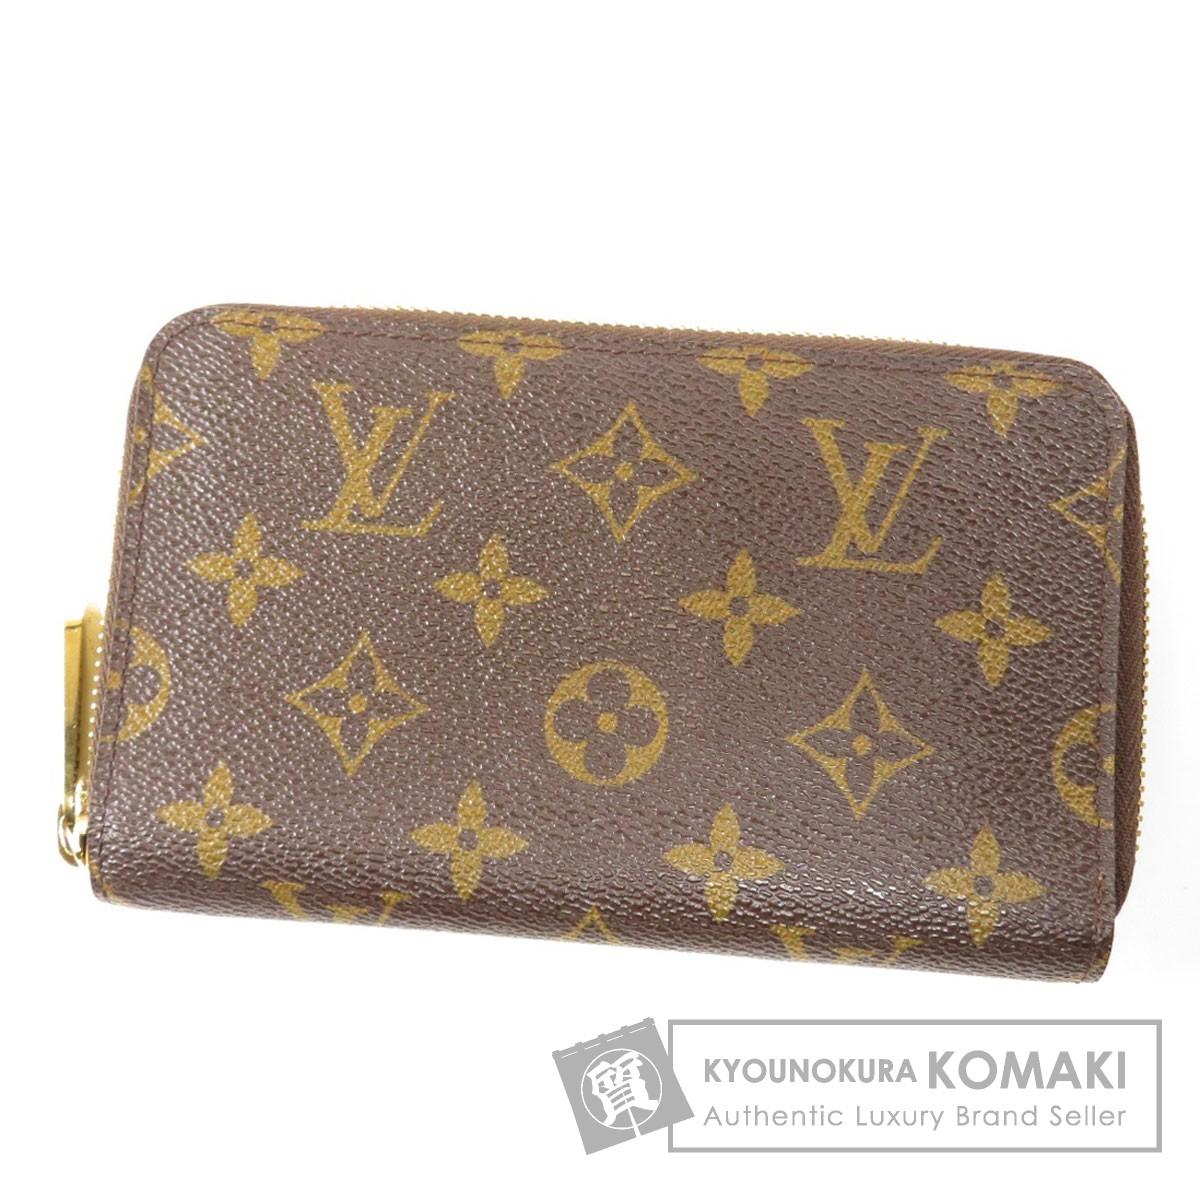 4e49d07083 Kyonokura Komaki Brand Cheapest Challenger: Authentic LOUIS VUITTON ...